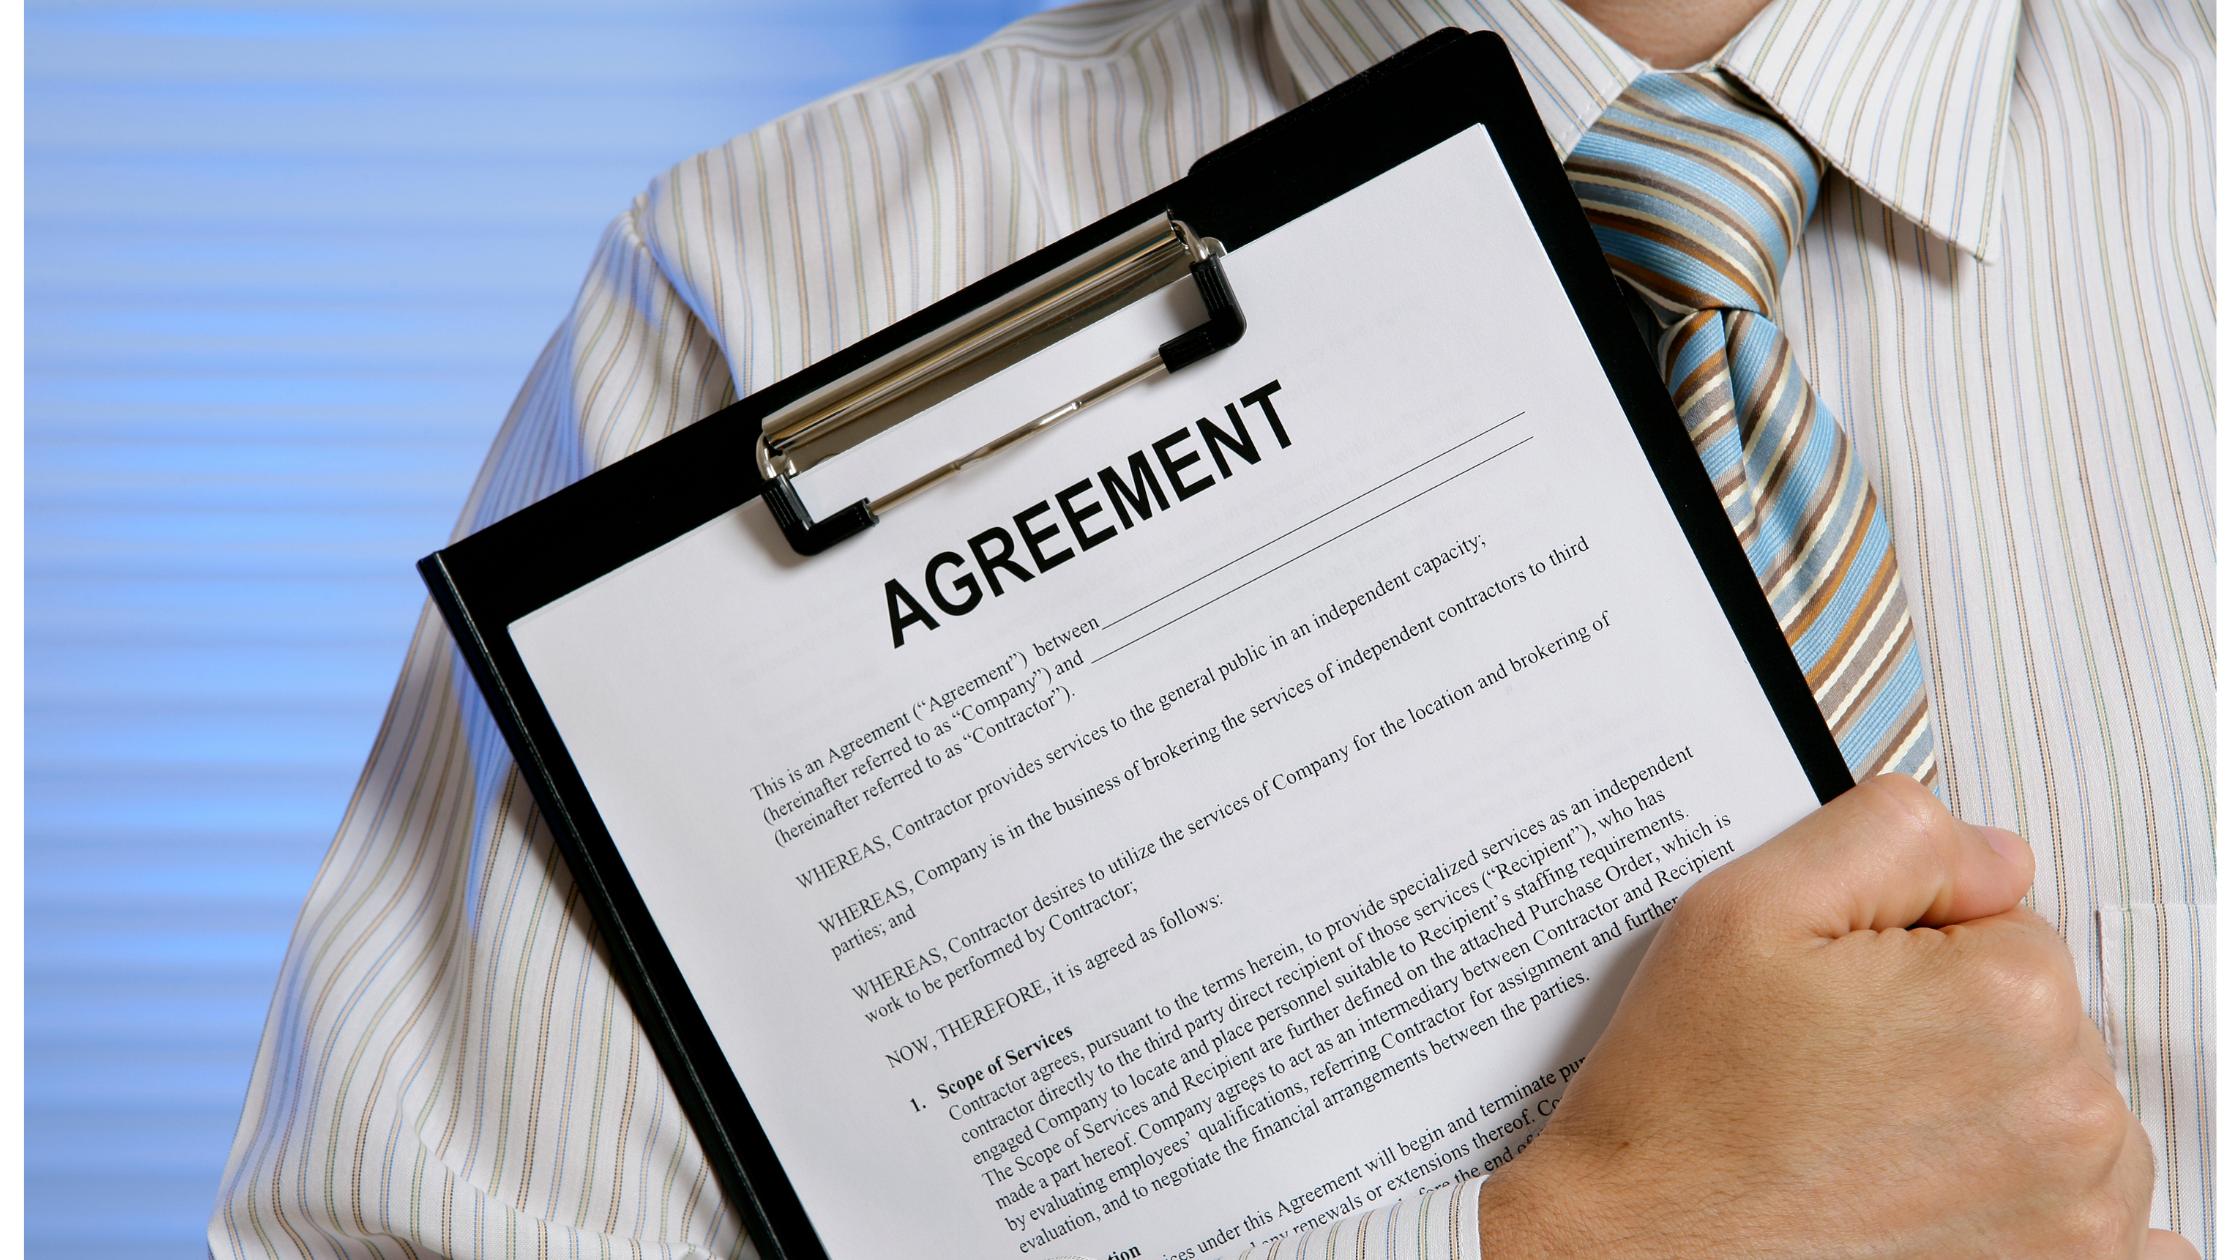 Minnesota LLC: The Operating Agreement is Critical